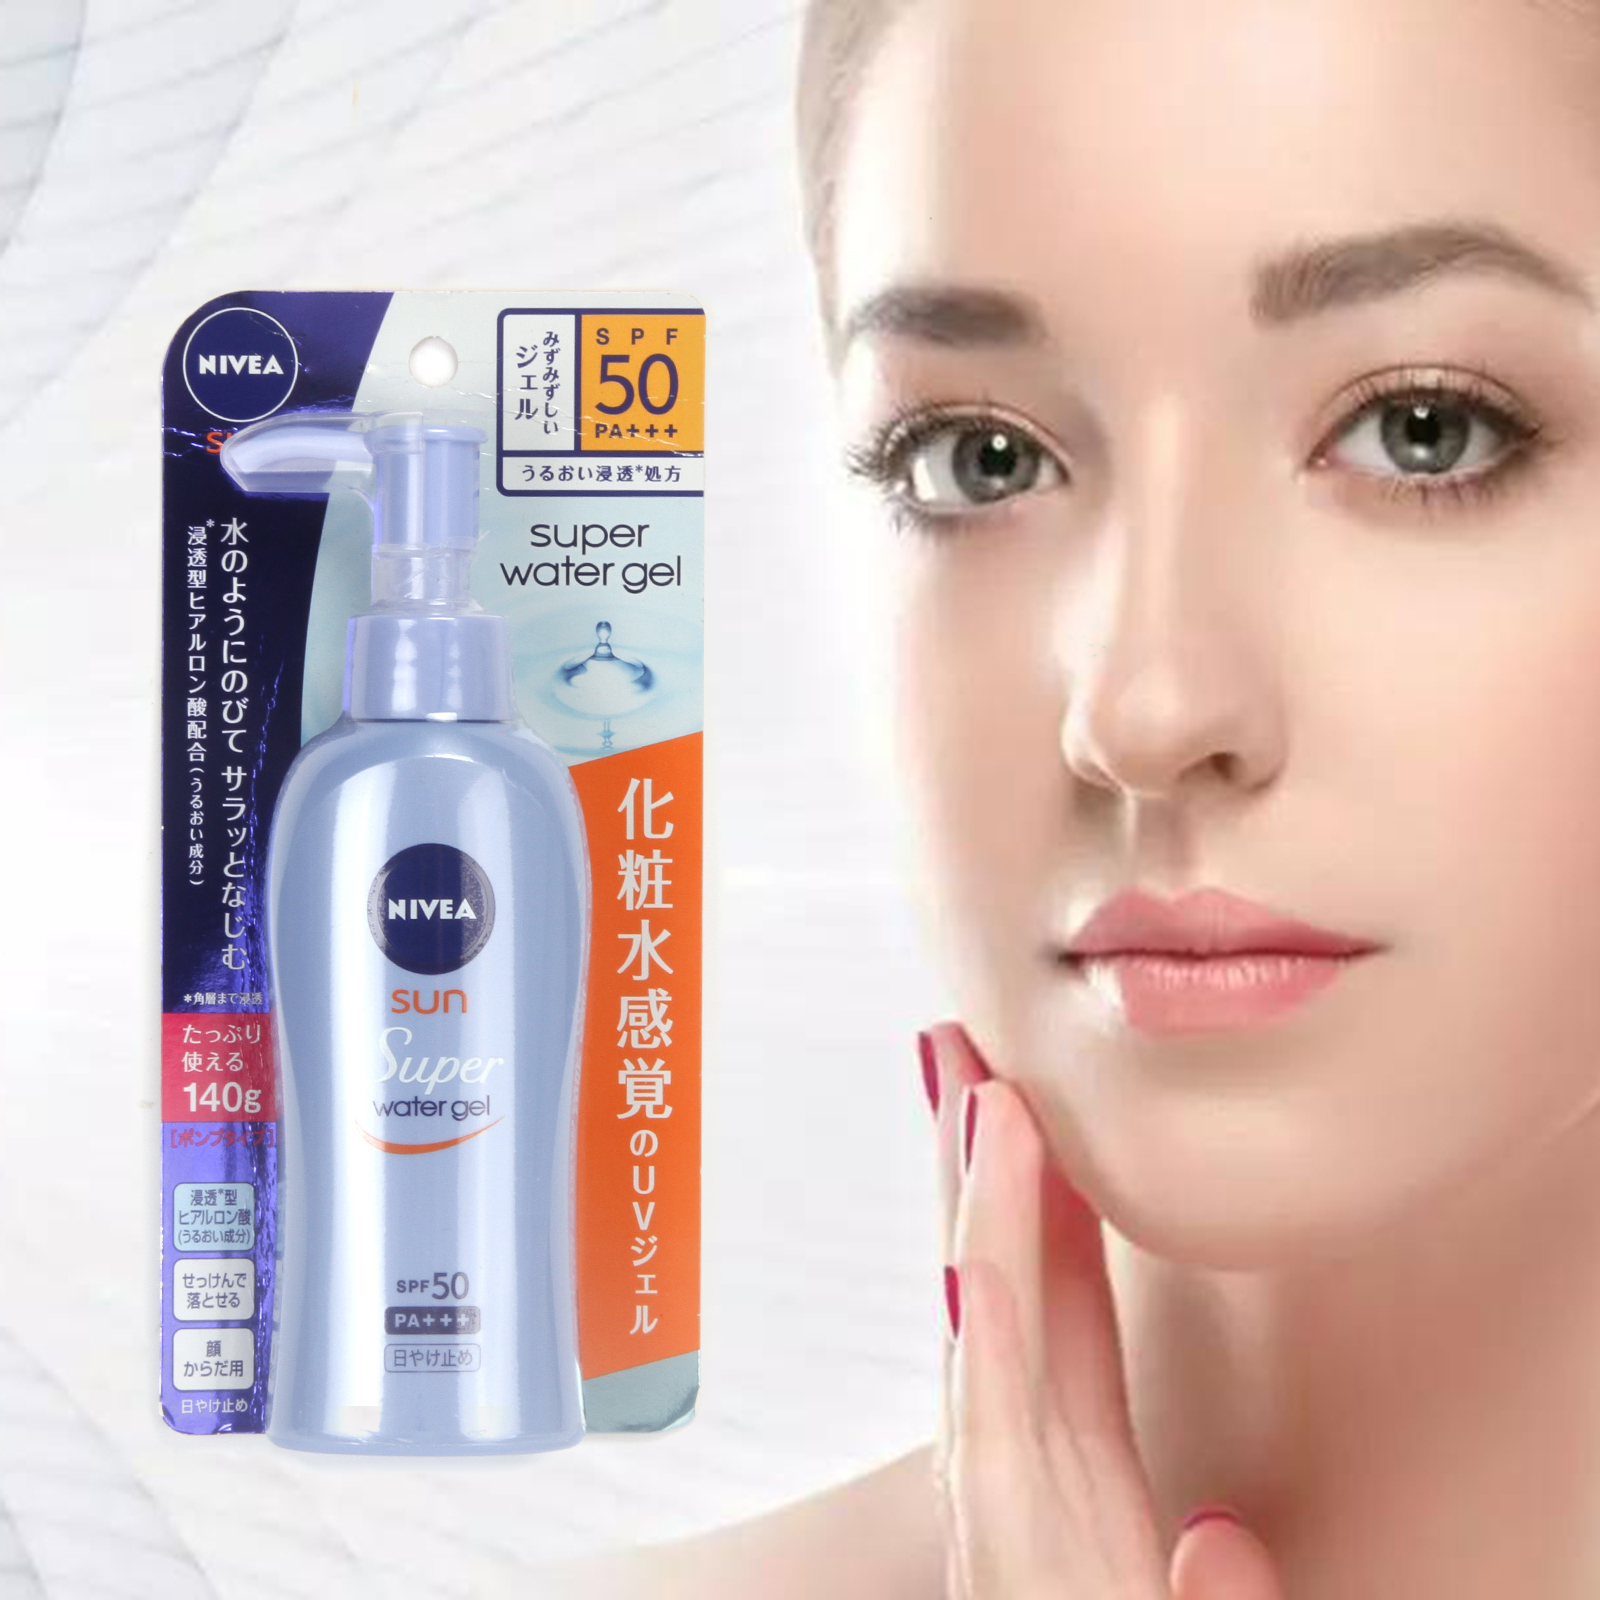 1pcs NIVEA Super SUN Protect Water Gel Sunscreen Hyaluronic SPF50/PA+++ 140g  Japan